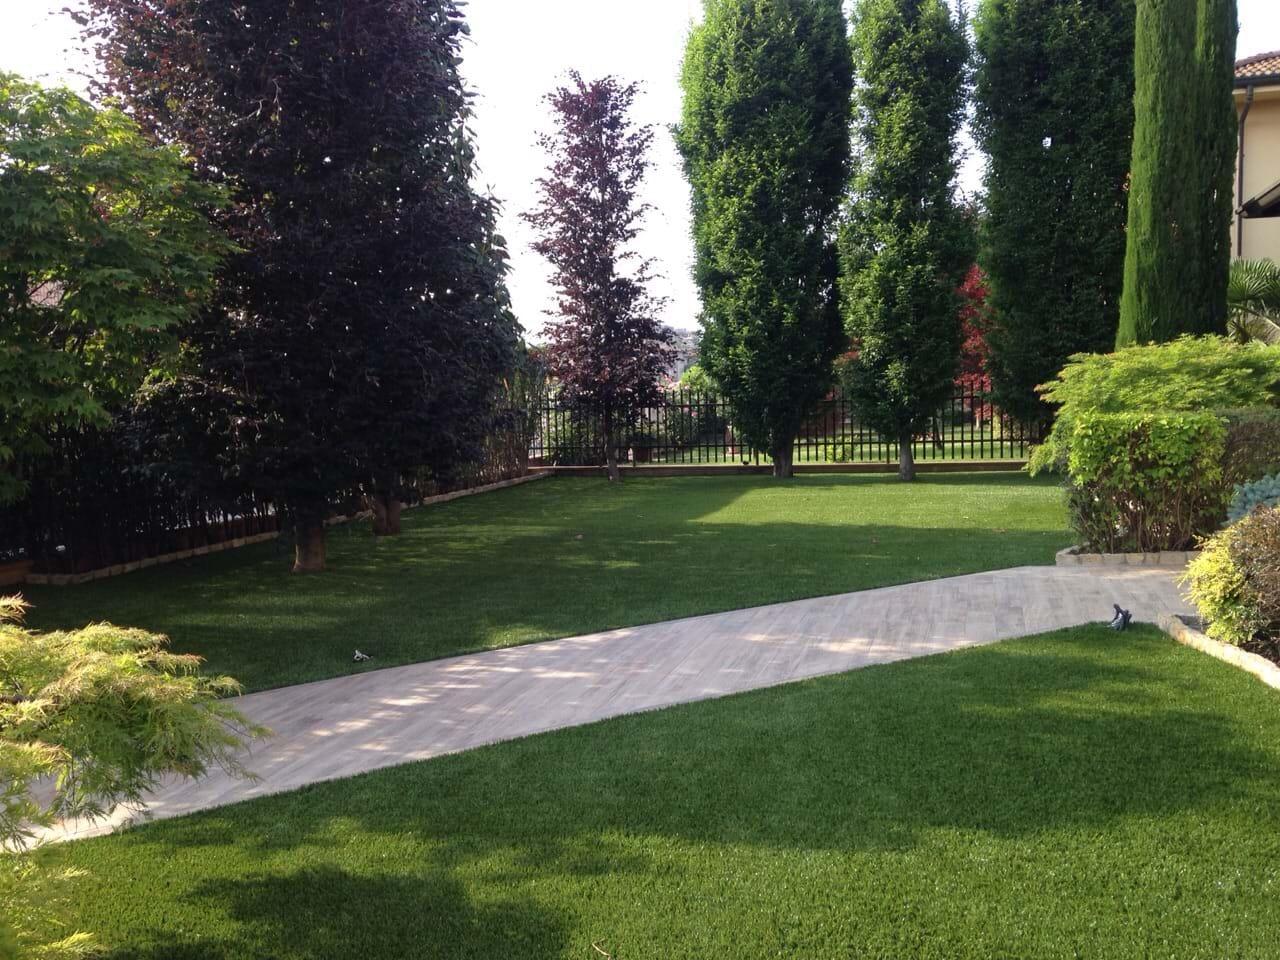 Giardini in erba sintetica prato sintetico bergamo - Giardini bergamo ...